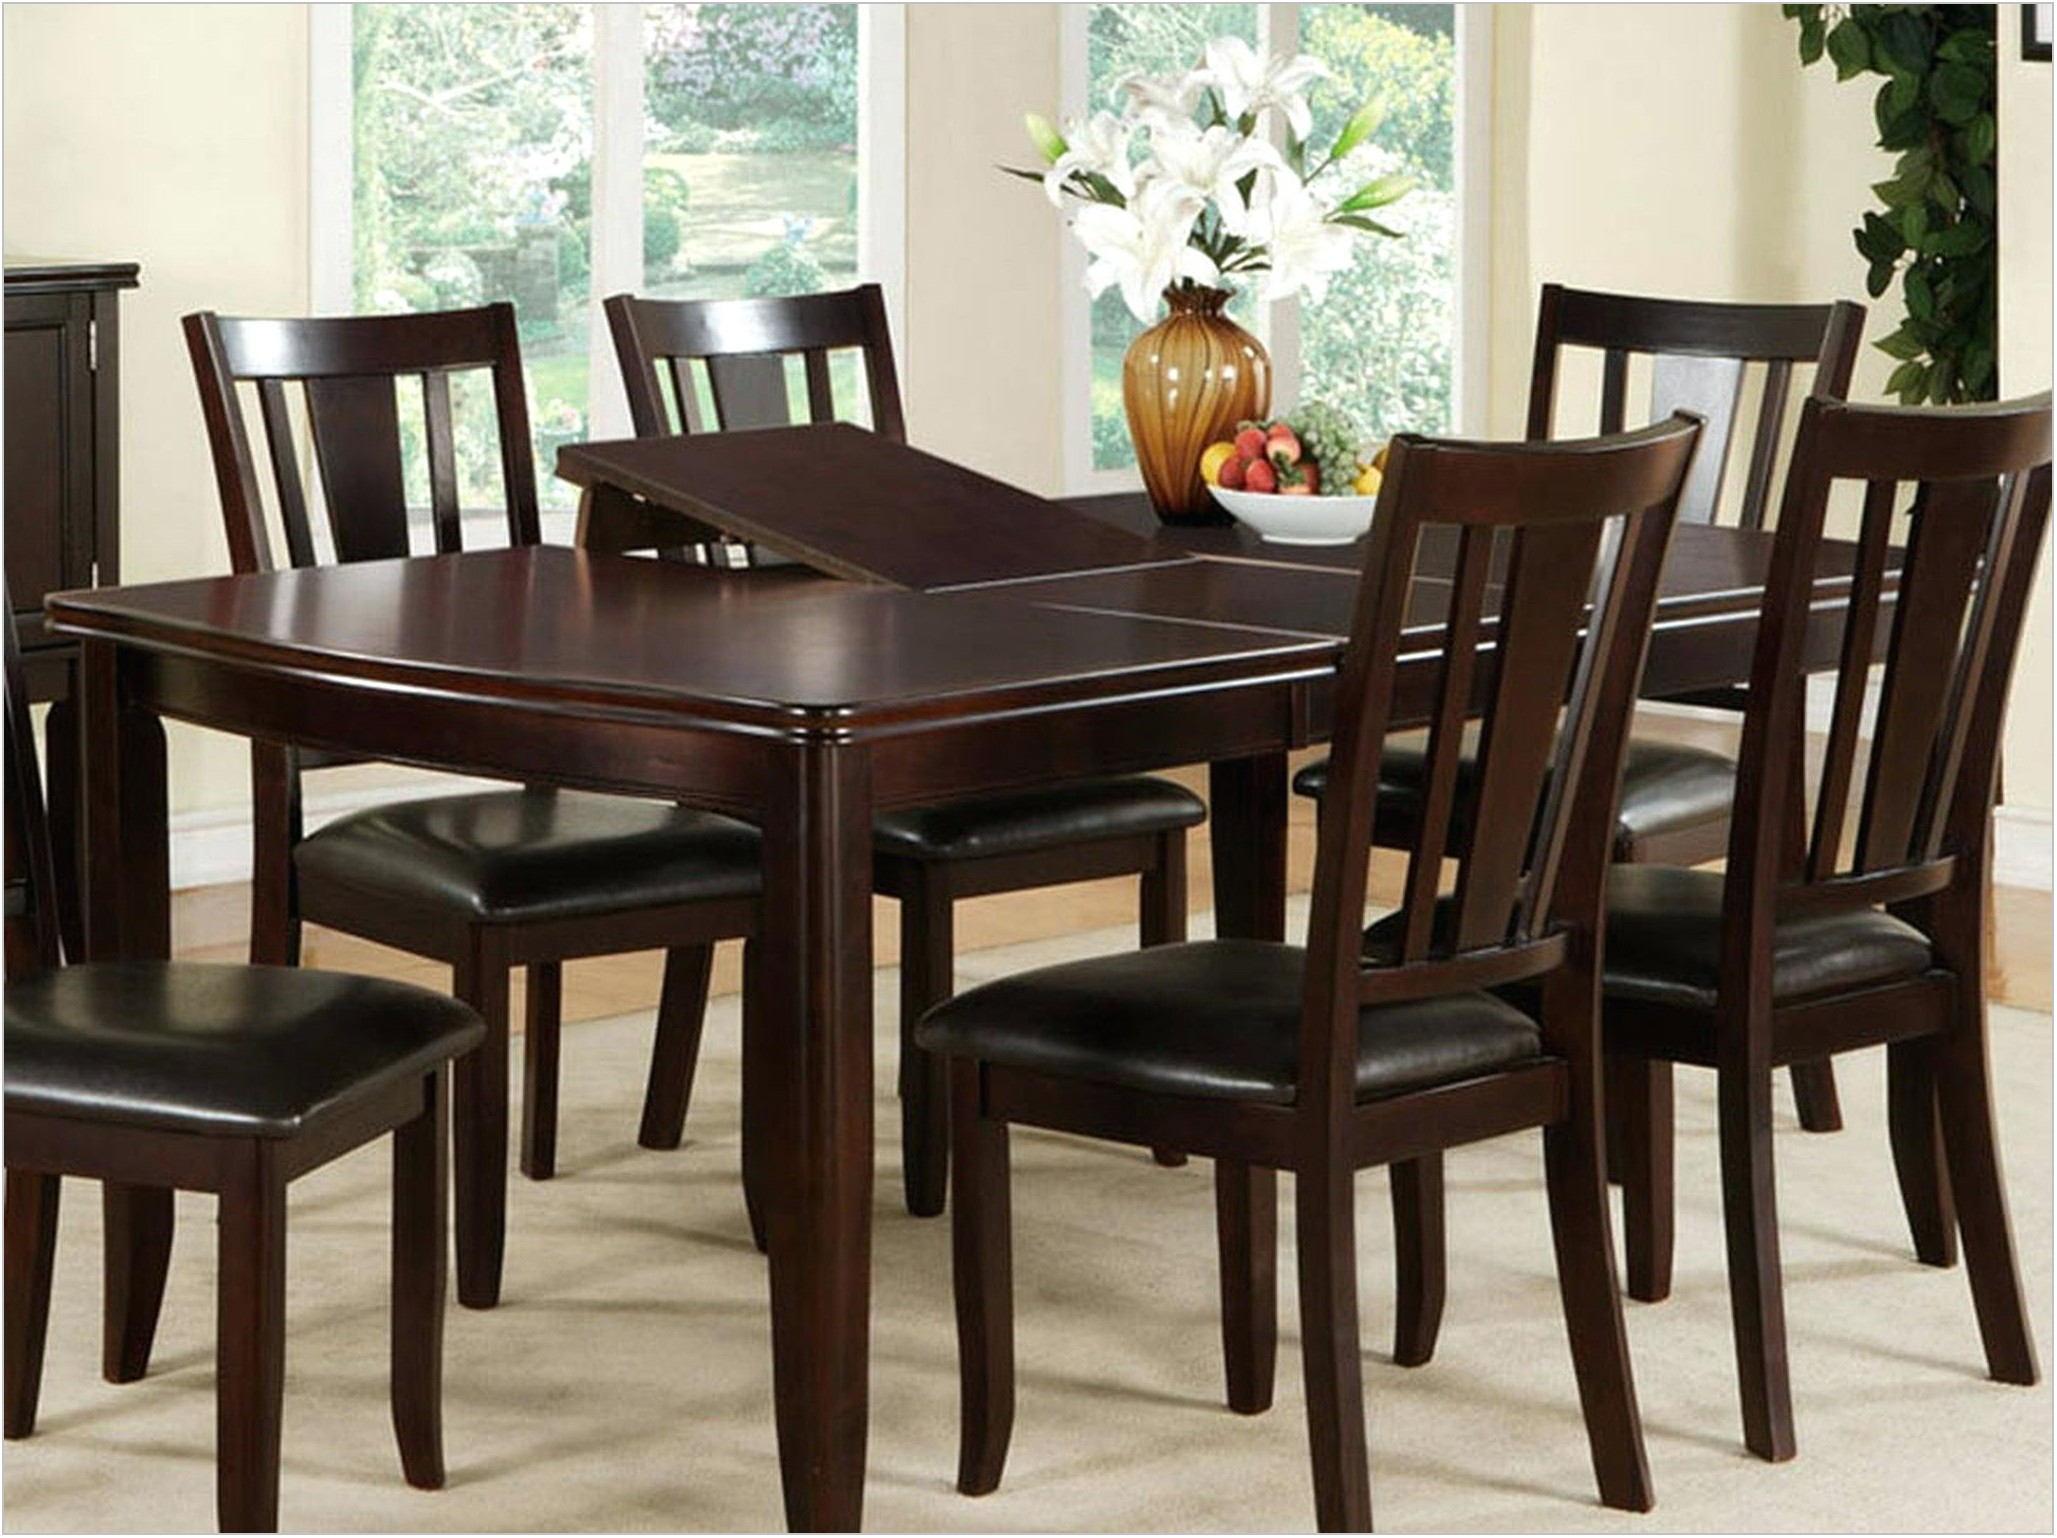 Mandara Dining Room Collection